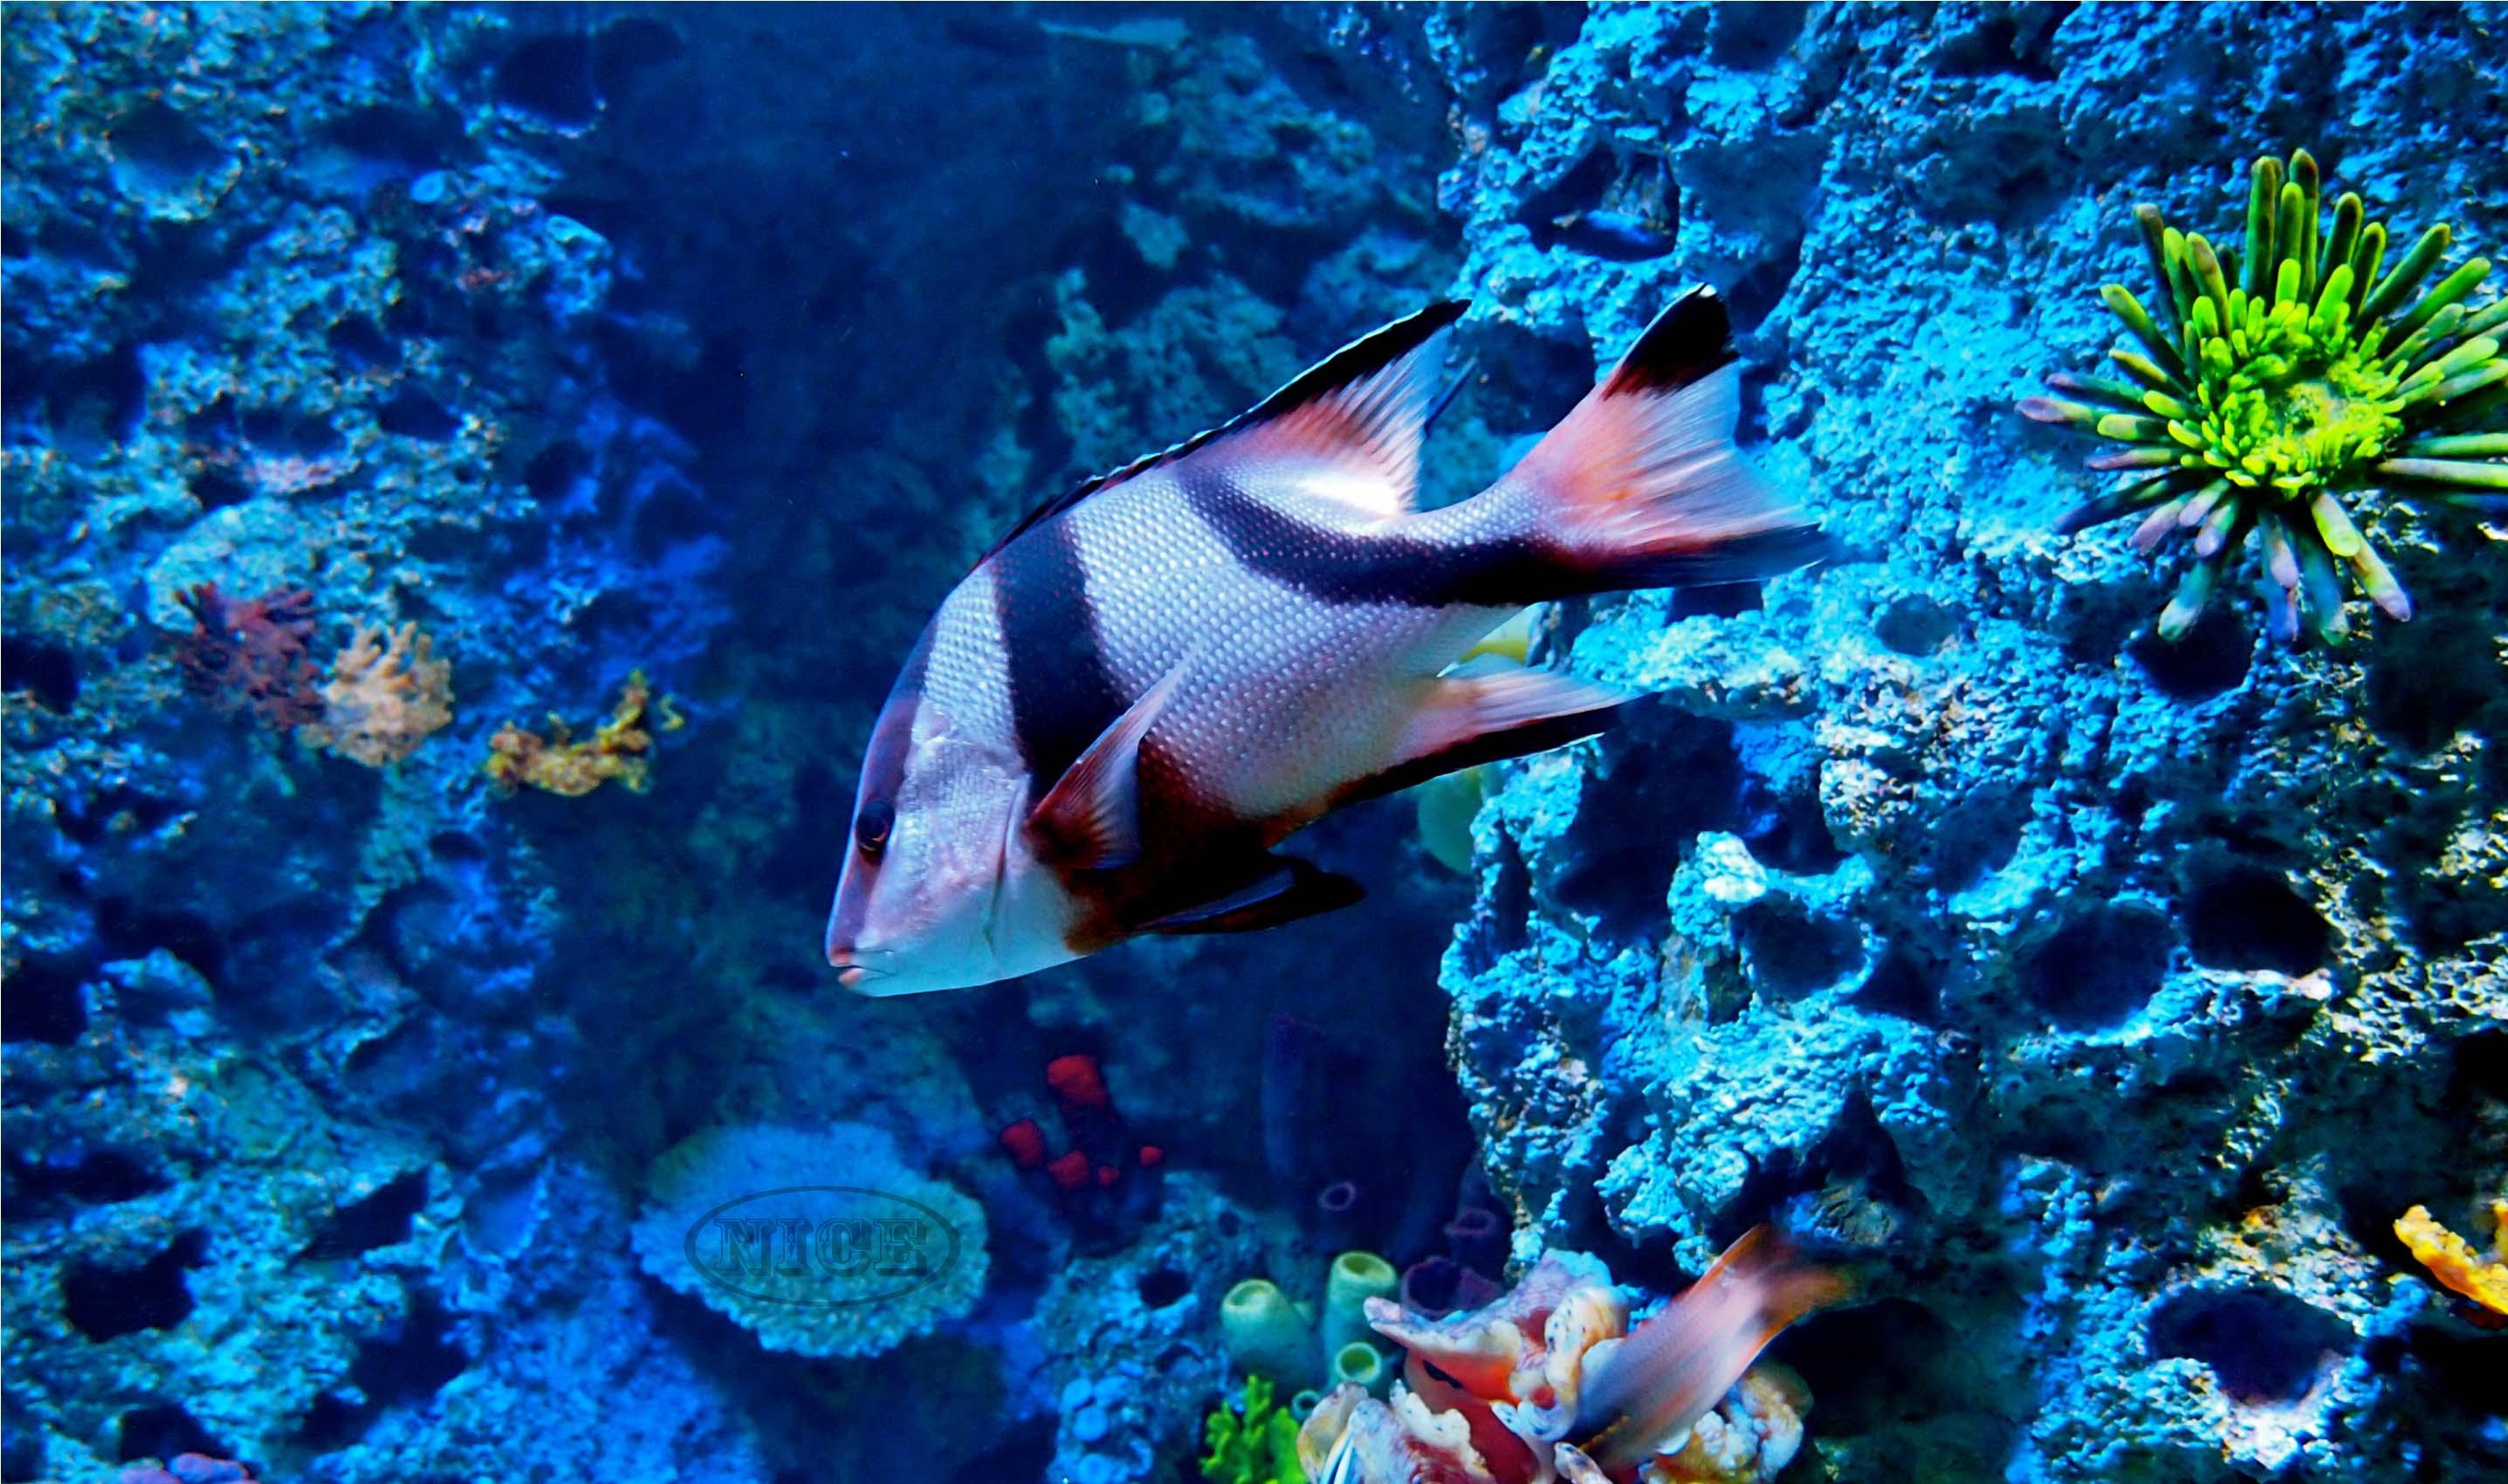 1438 ocean hd wallpapers - photo #34